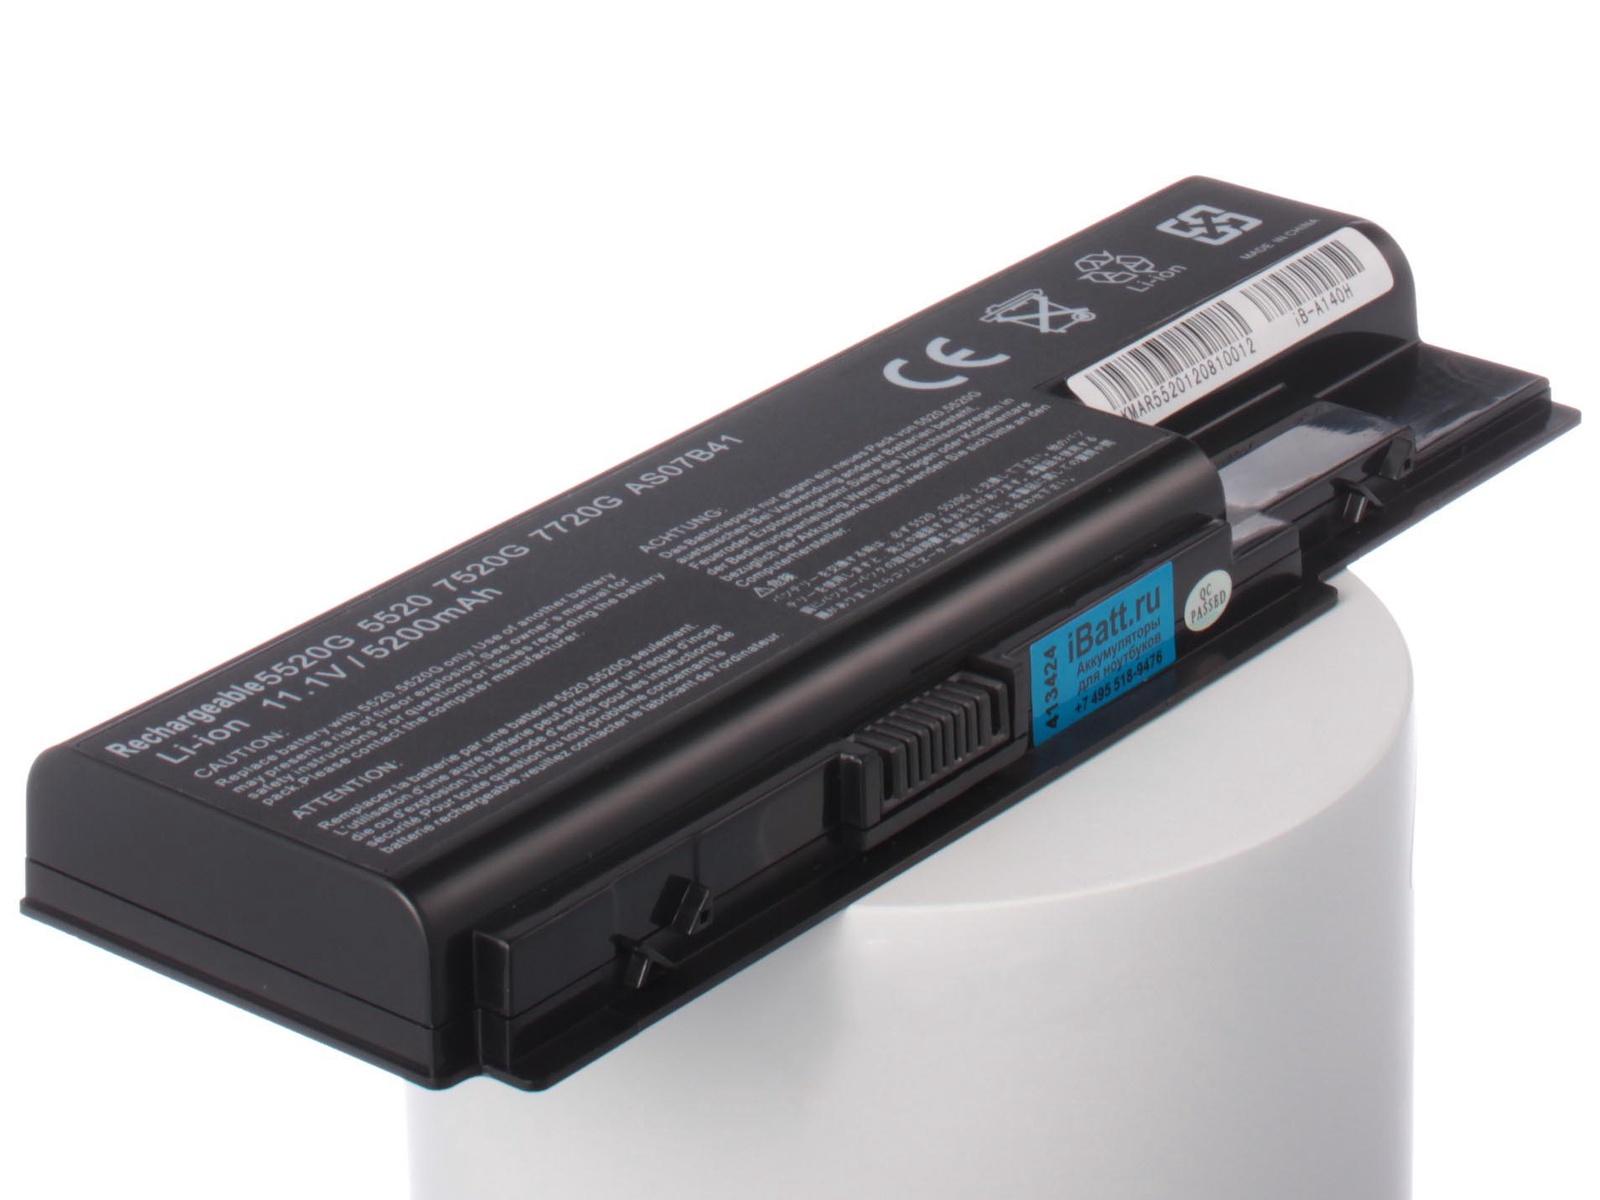 Аккумулятор для ноутбука iBatt Acer Extensa 7630G-652G25Mi, Aspire 5942G-334G50Mi, 6920G-6A4G25MN, 6930G-644G25Mx, 6930Z, 7520G-503G32Mi, 7540G-304G25Mi, 7738G-874G50Mi